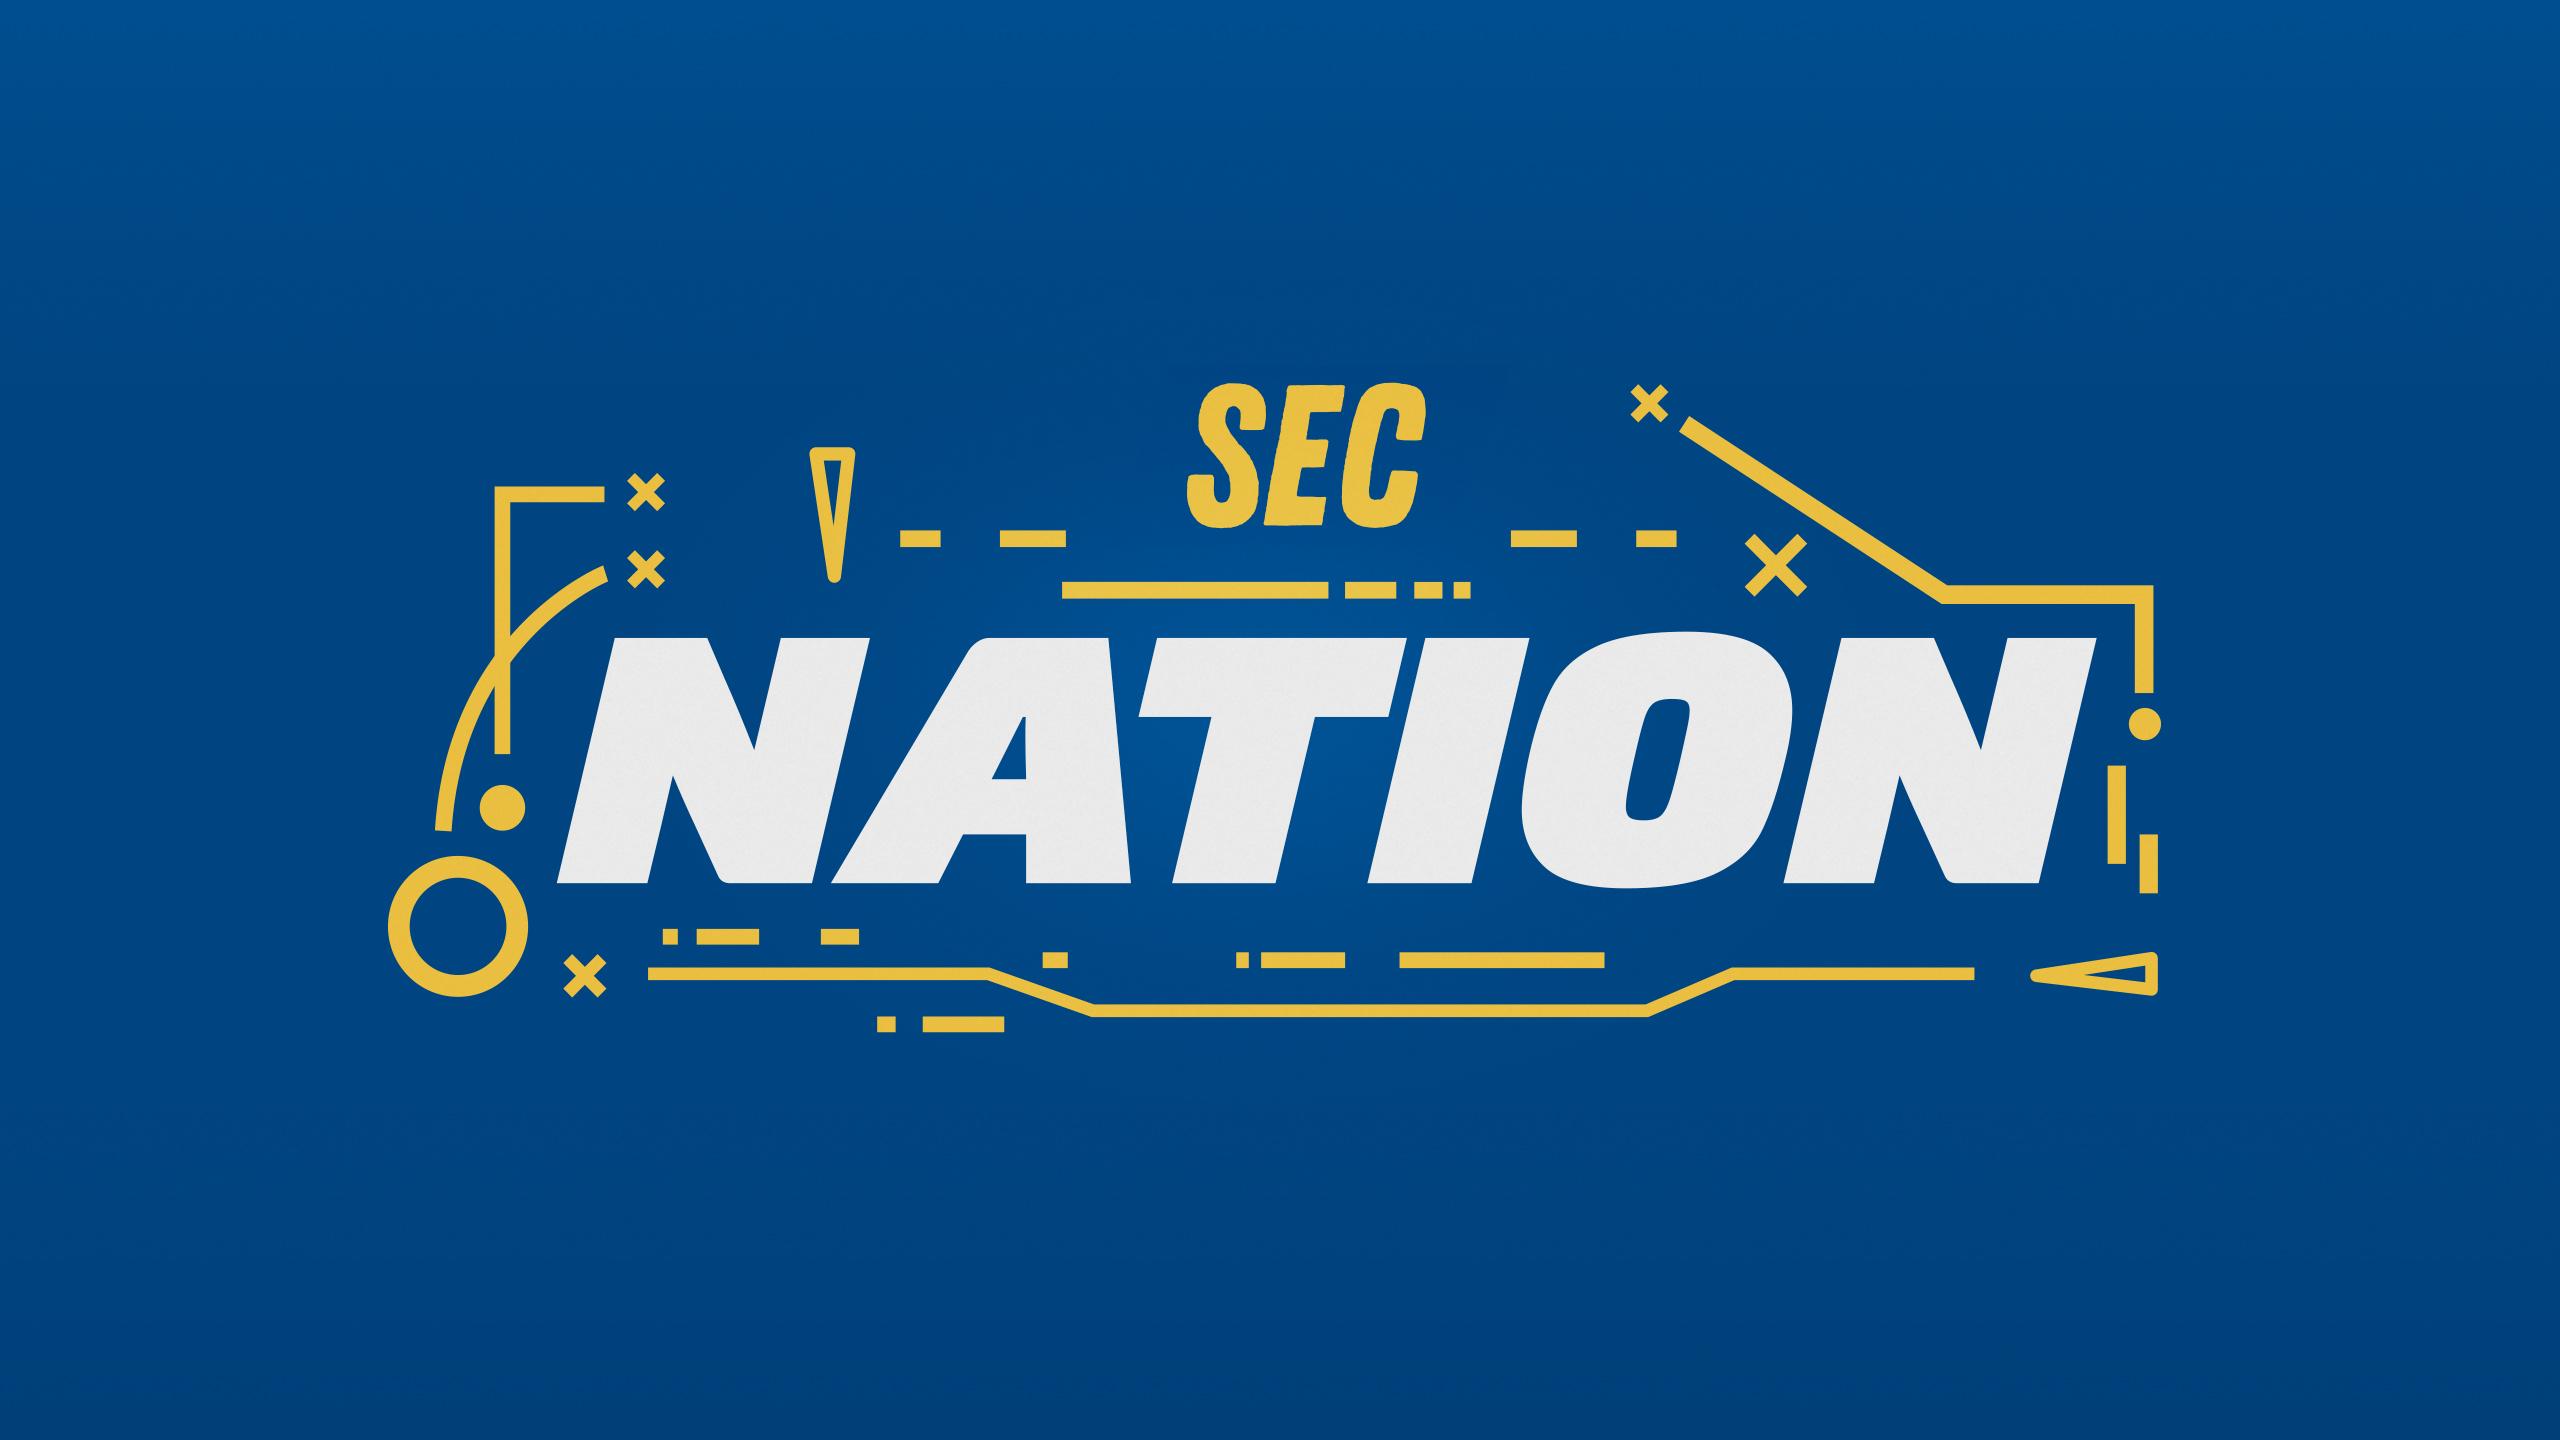 Thu, 12/6 - SEC Nation Bowl Preview